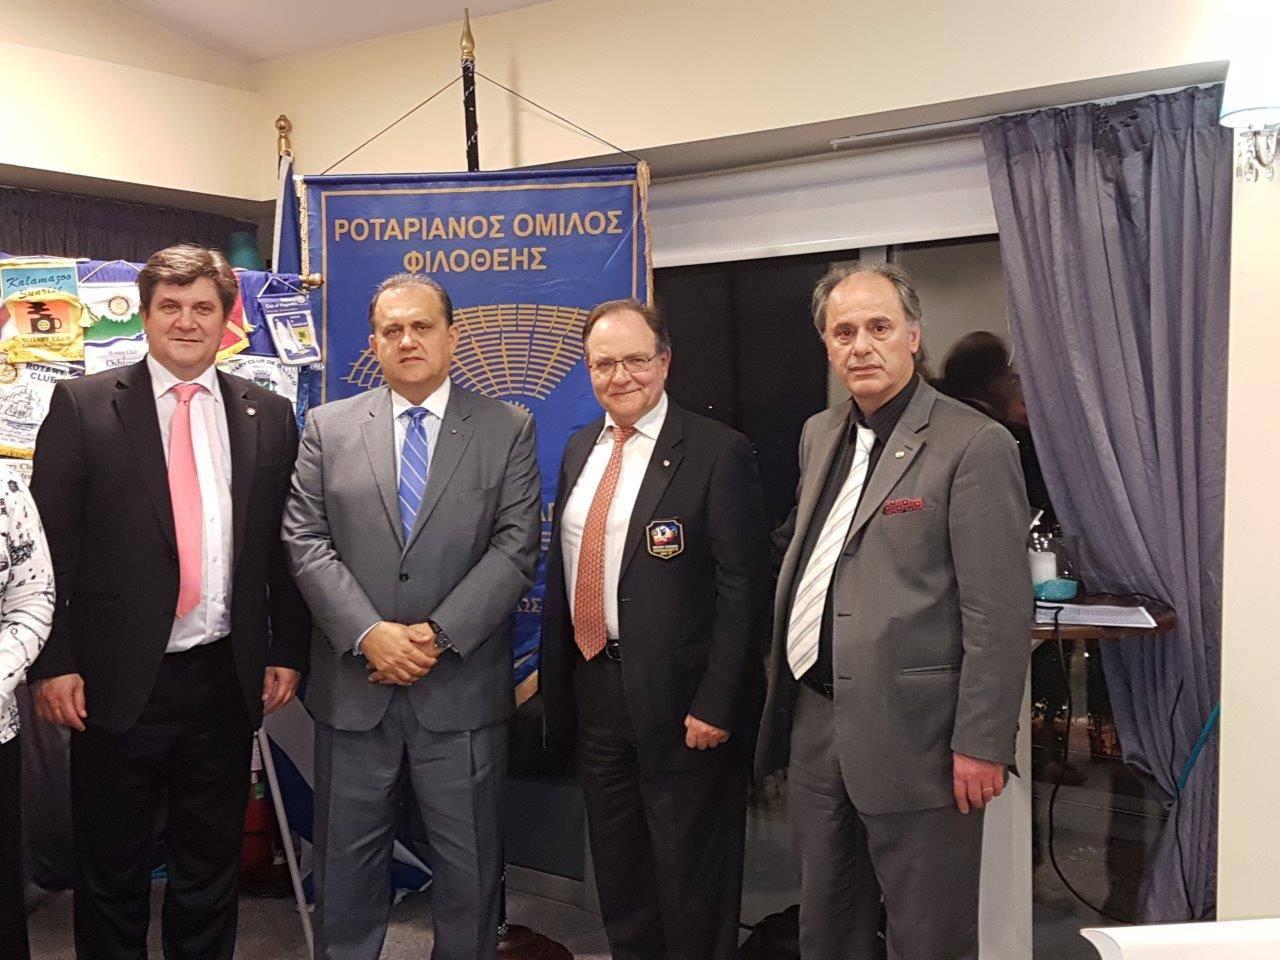 Nick Larigakis with Propeller Club President, George Xiridakis and President of the Marousi Chapter of the Rotary Club Internatinoal, Angelos Karmanliolas.